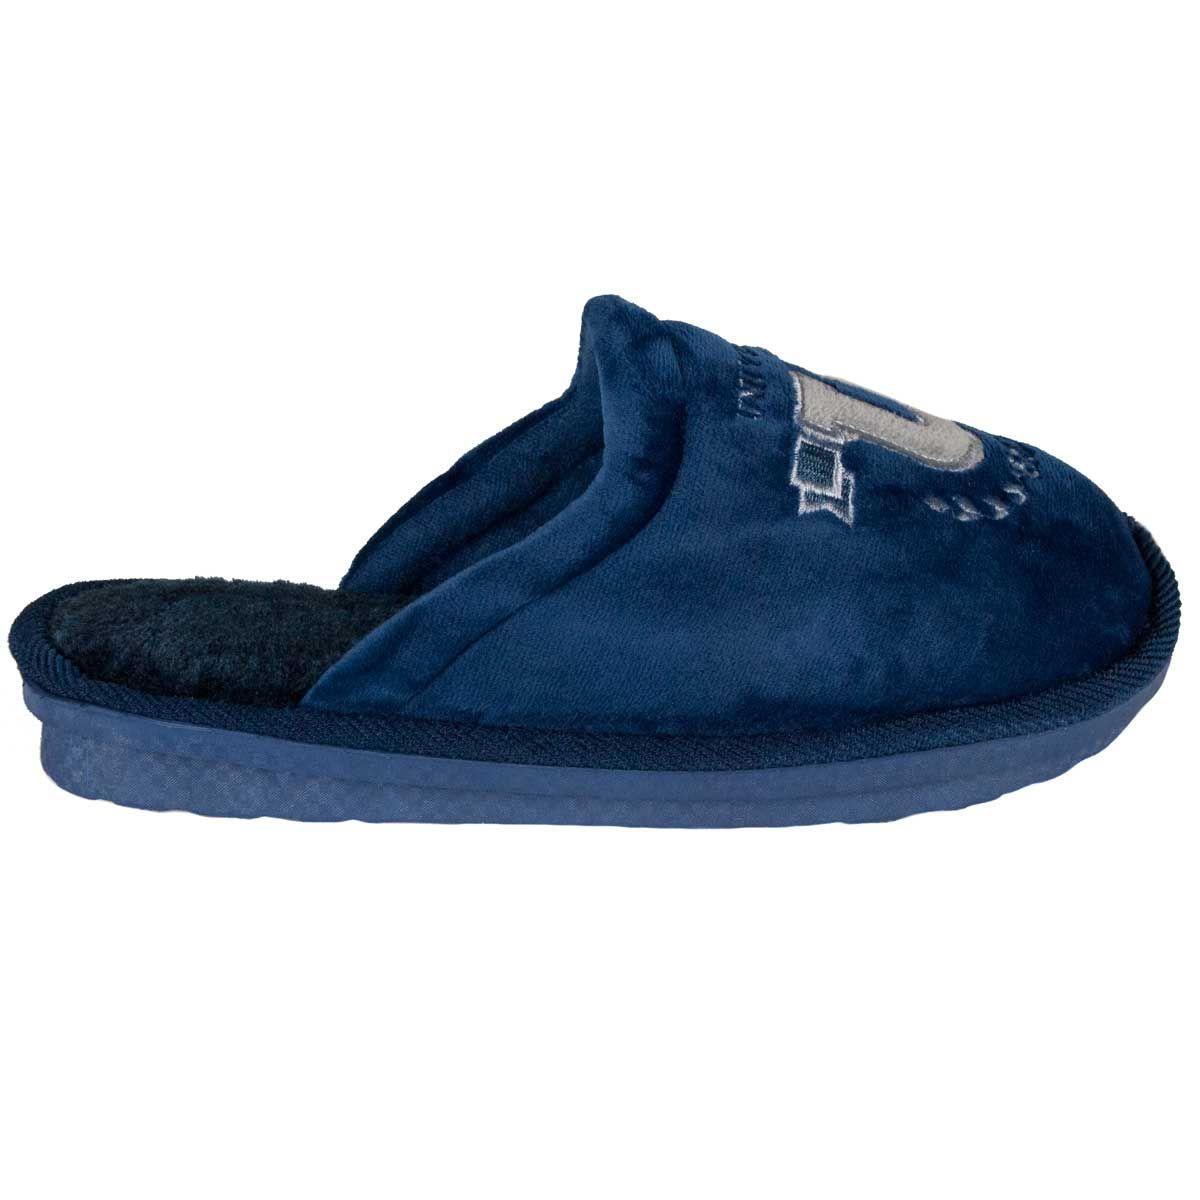 Montevita Comfortable Slipper in Blue